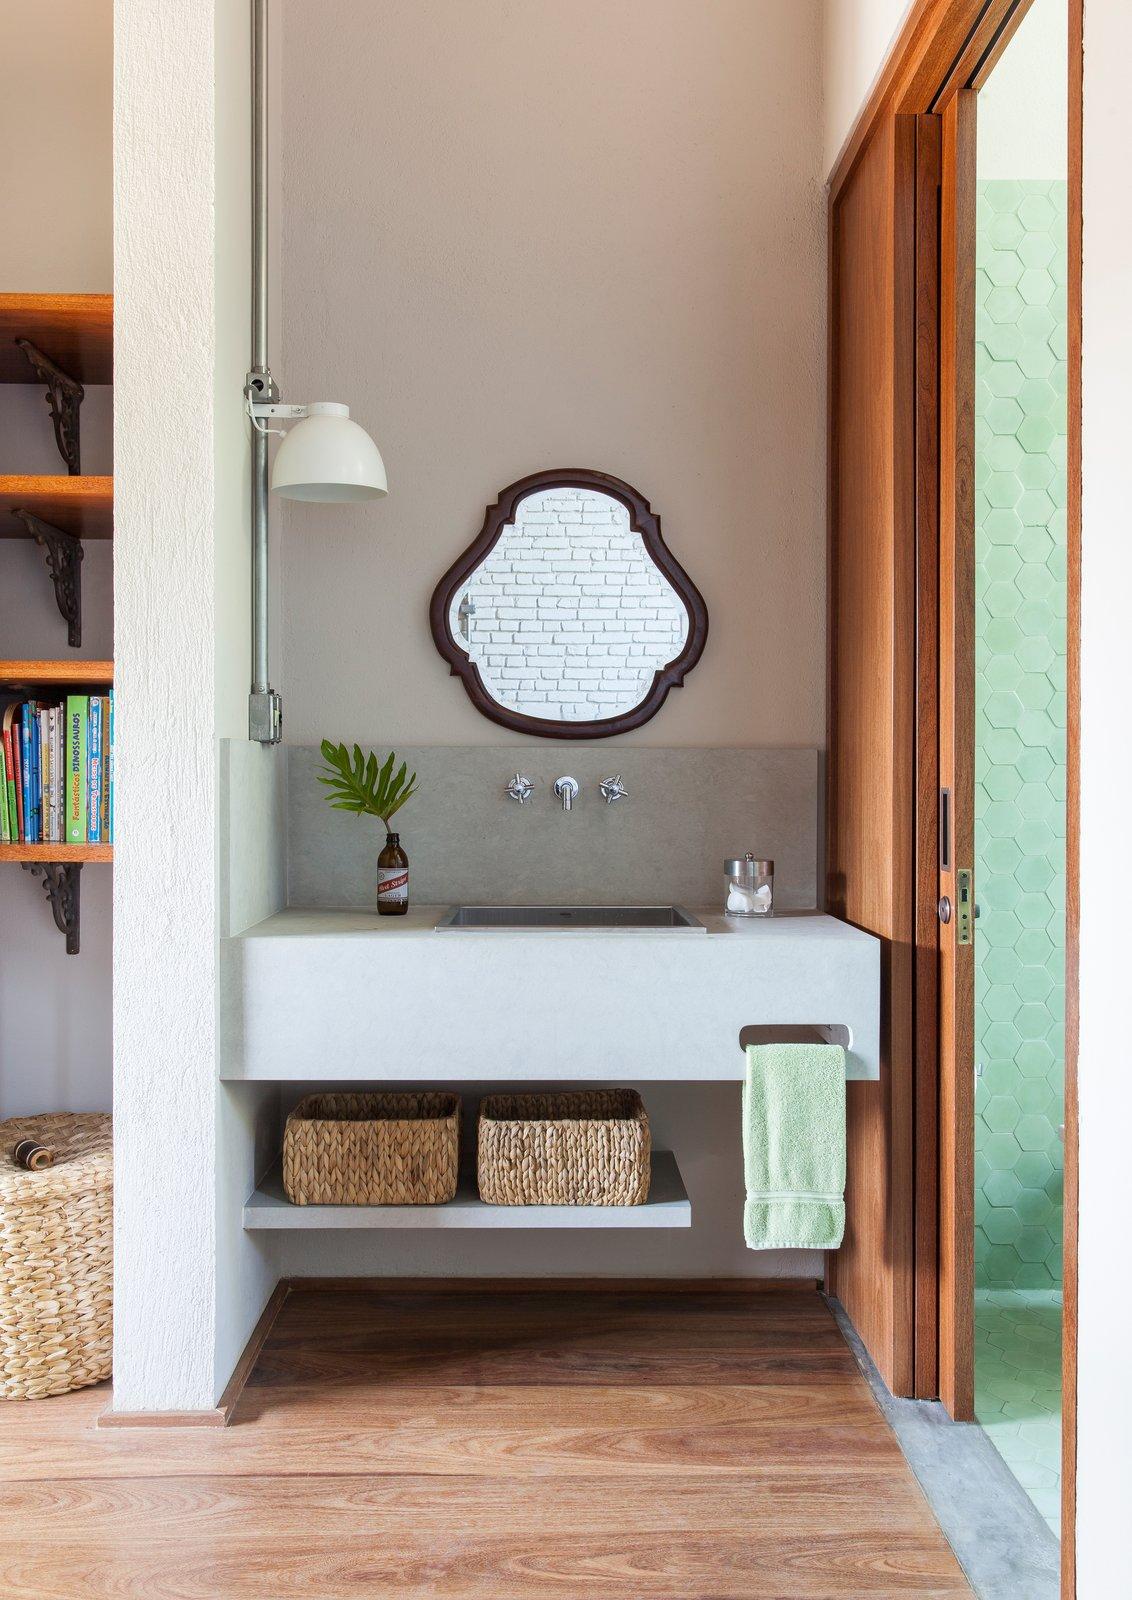 Bath Room, Wall Mount Sink, Concrete Wall, Light Hardwood Floor, and Wall Lighting  Conde D'eu House